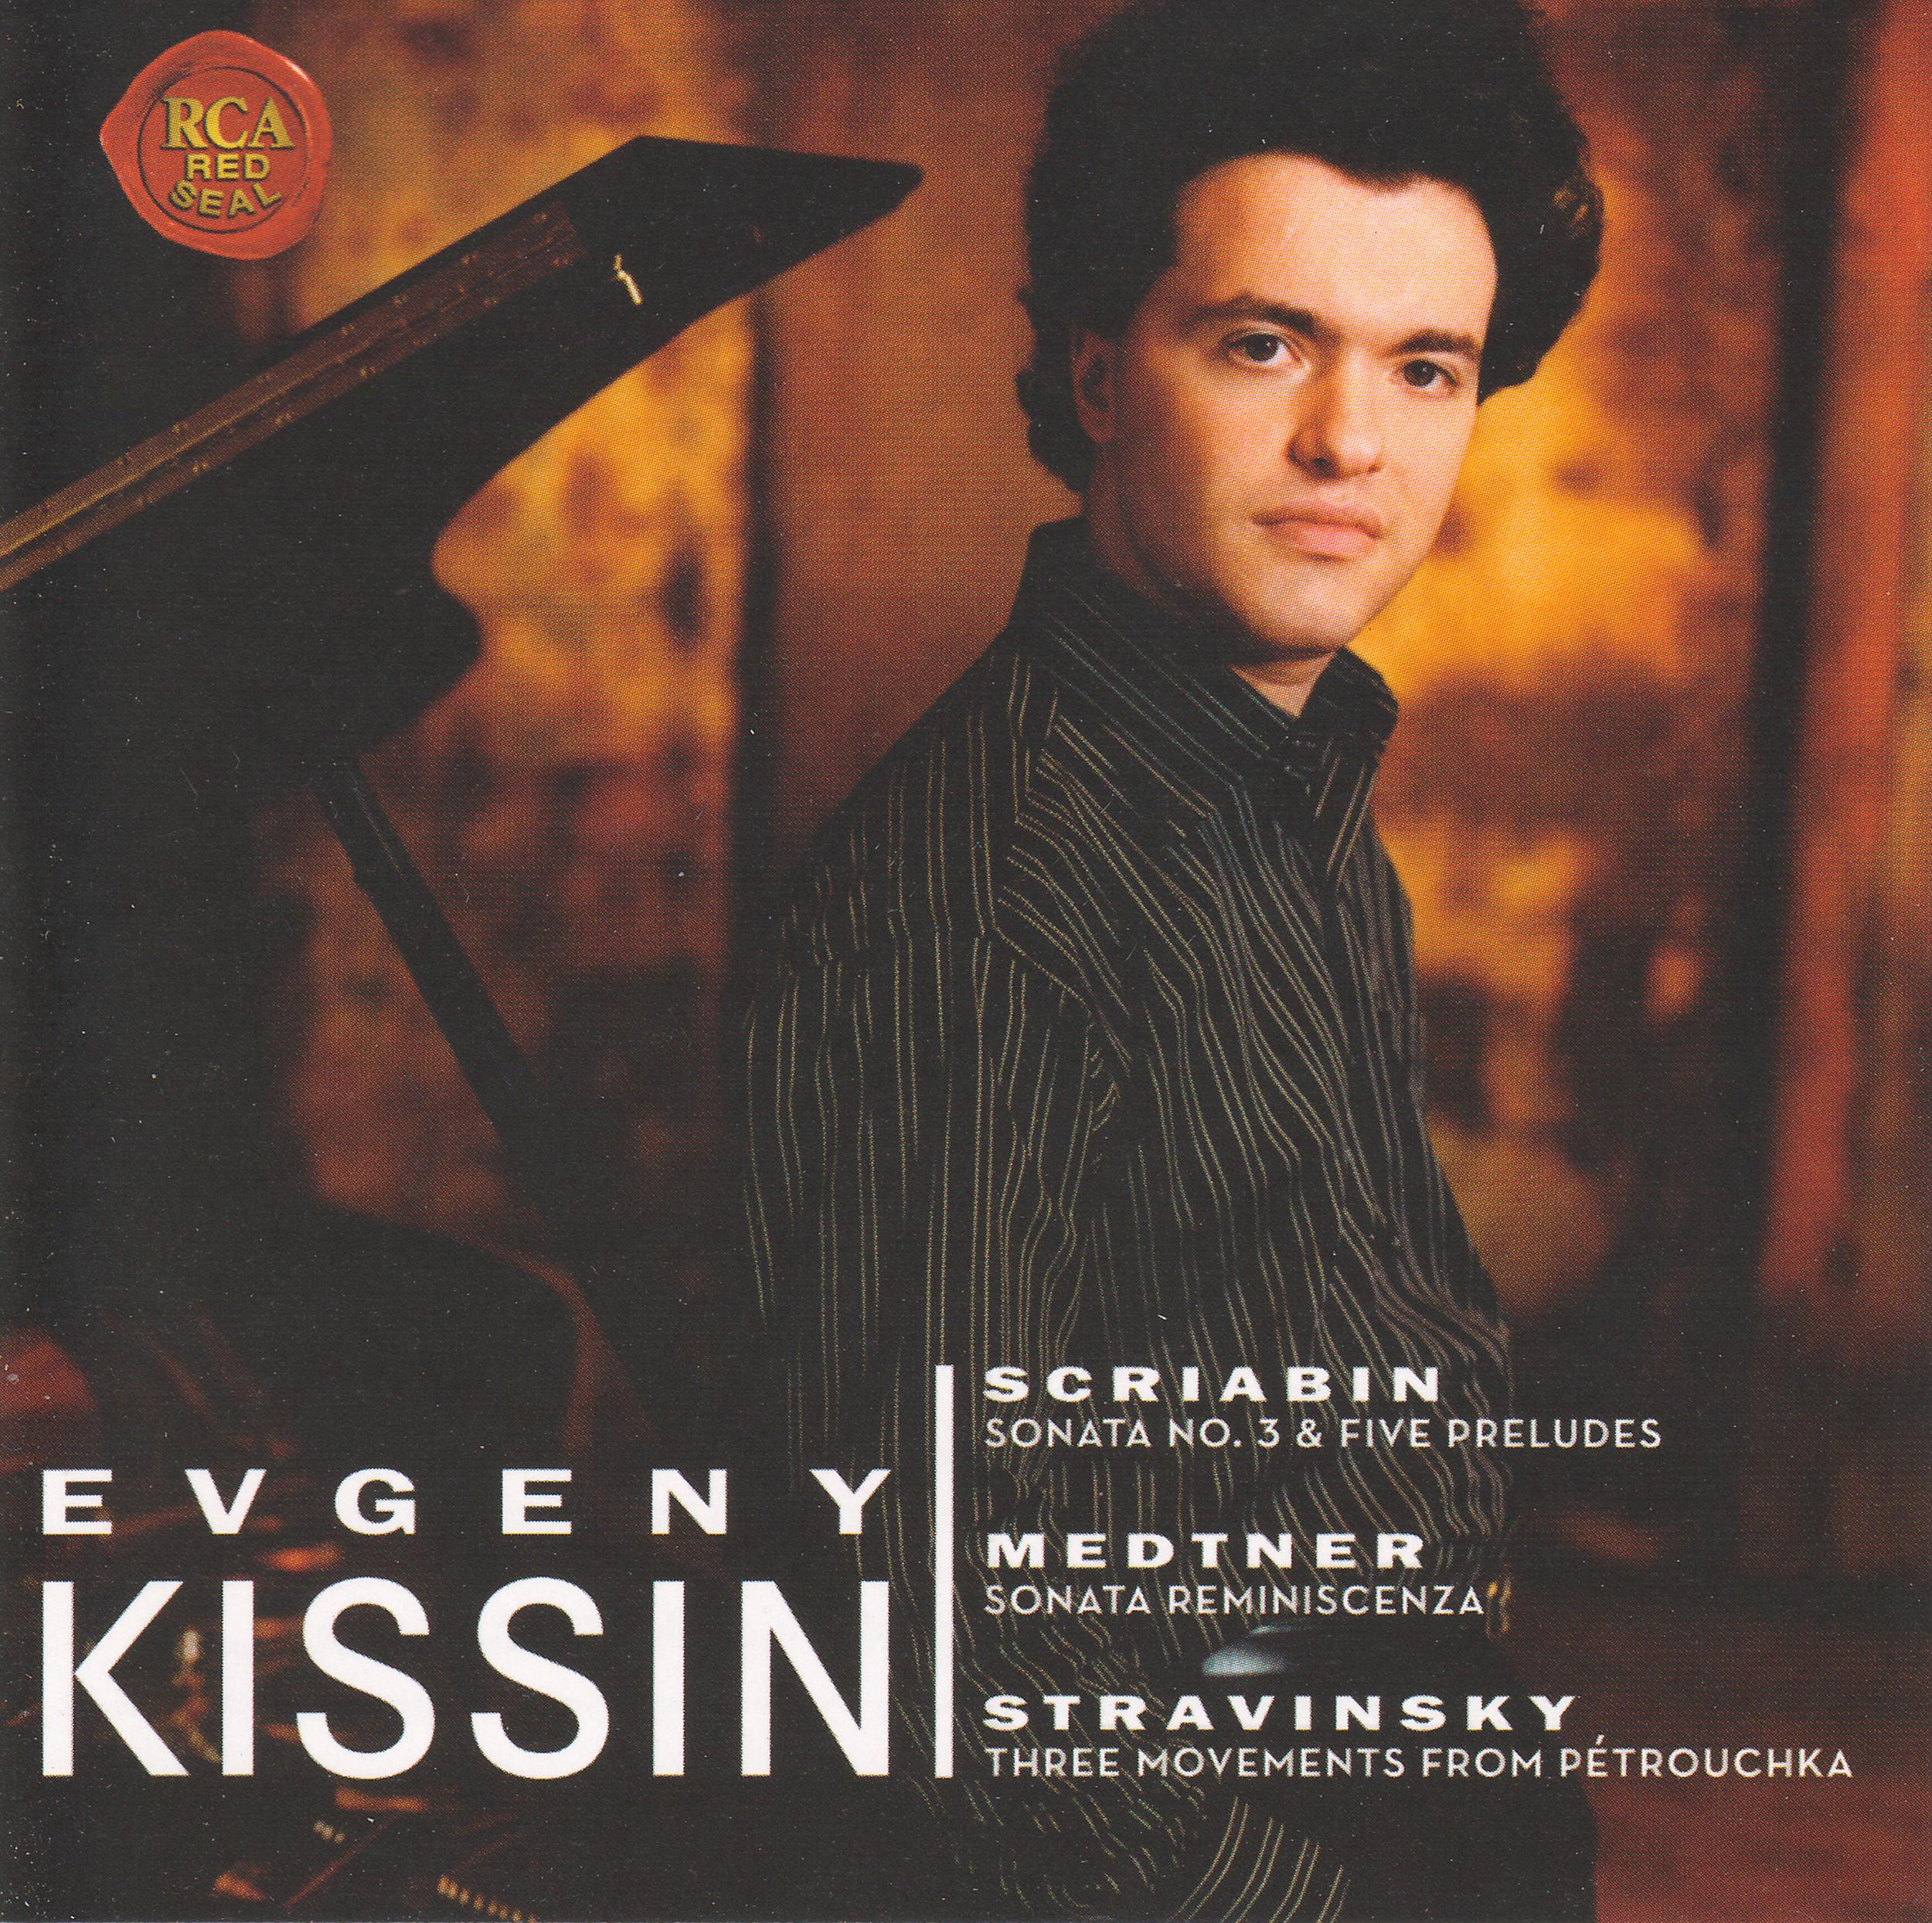 kissin russian CD.jpg